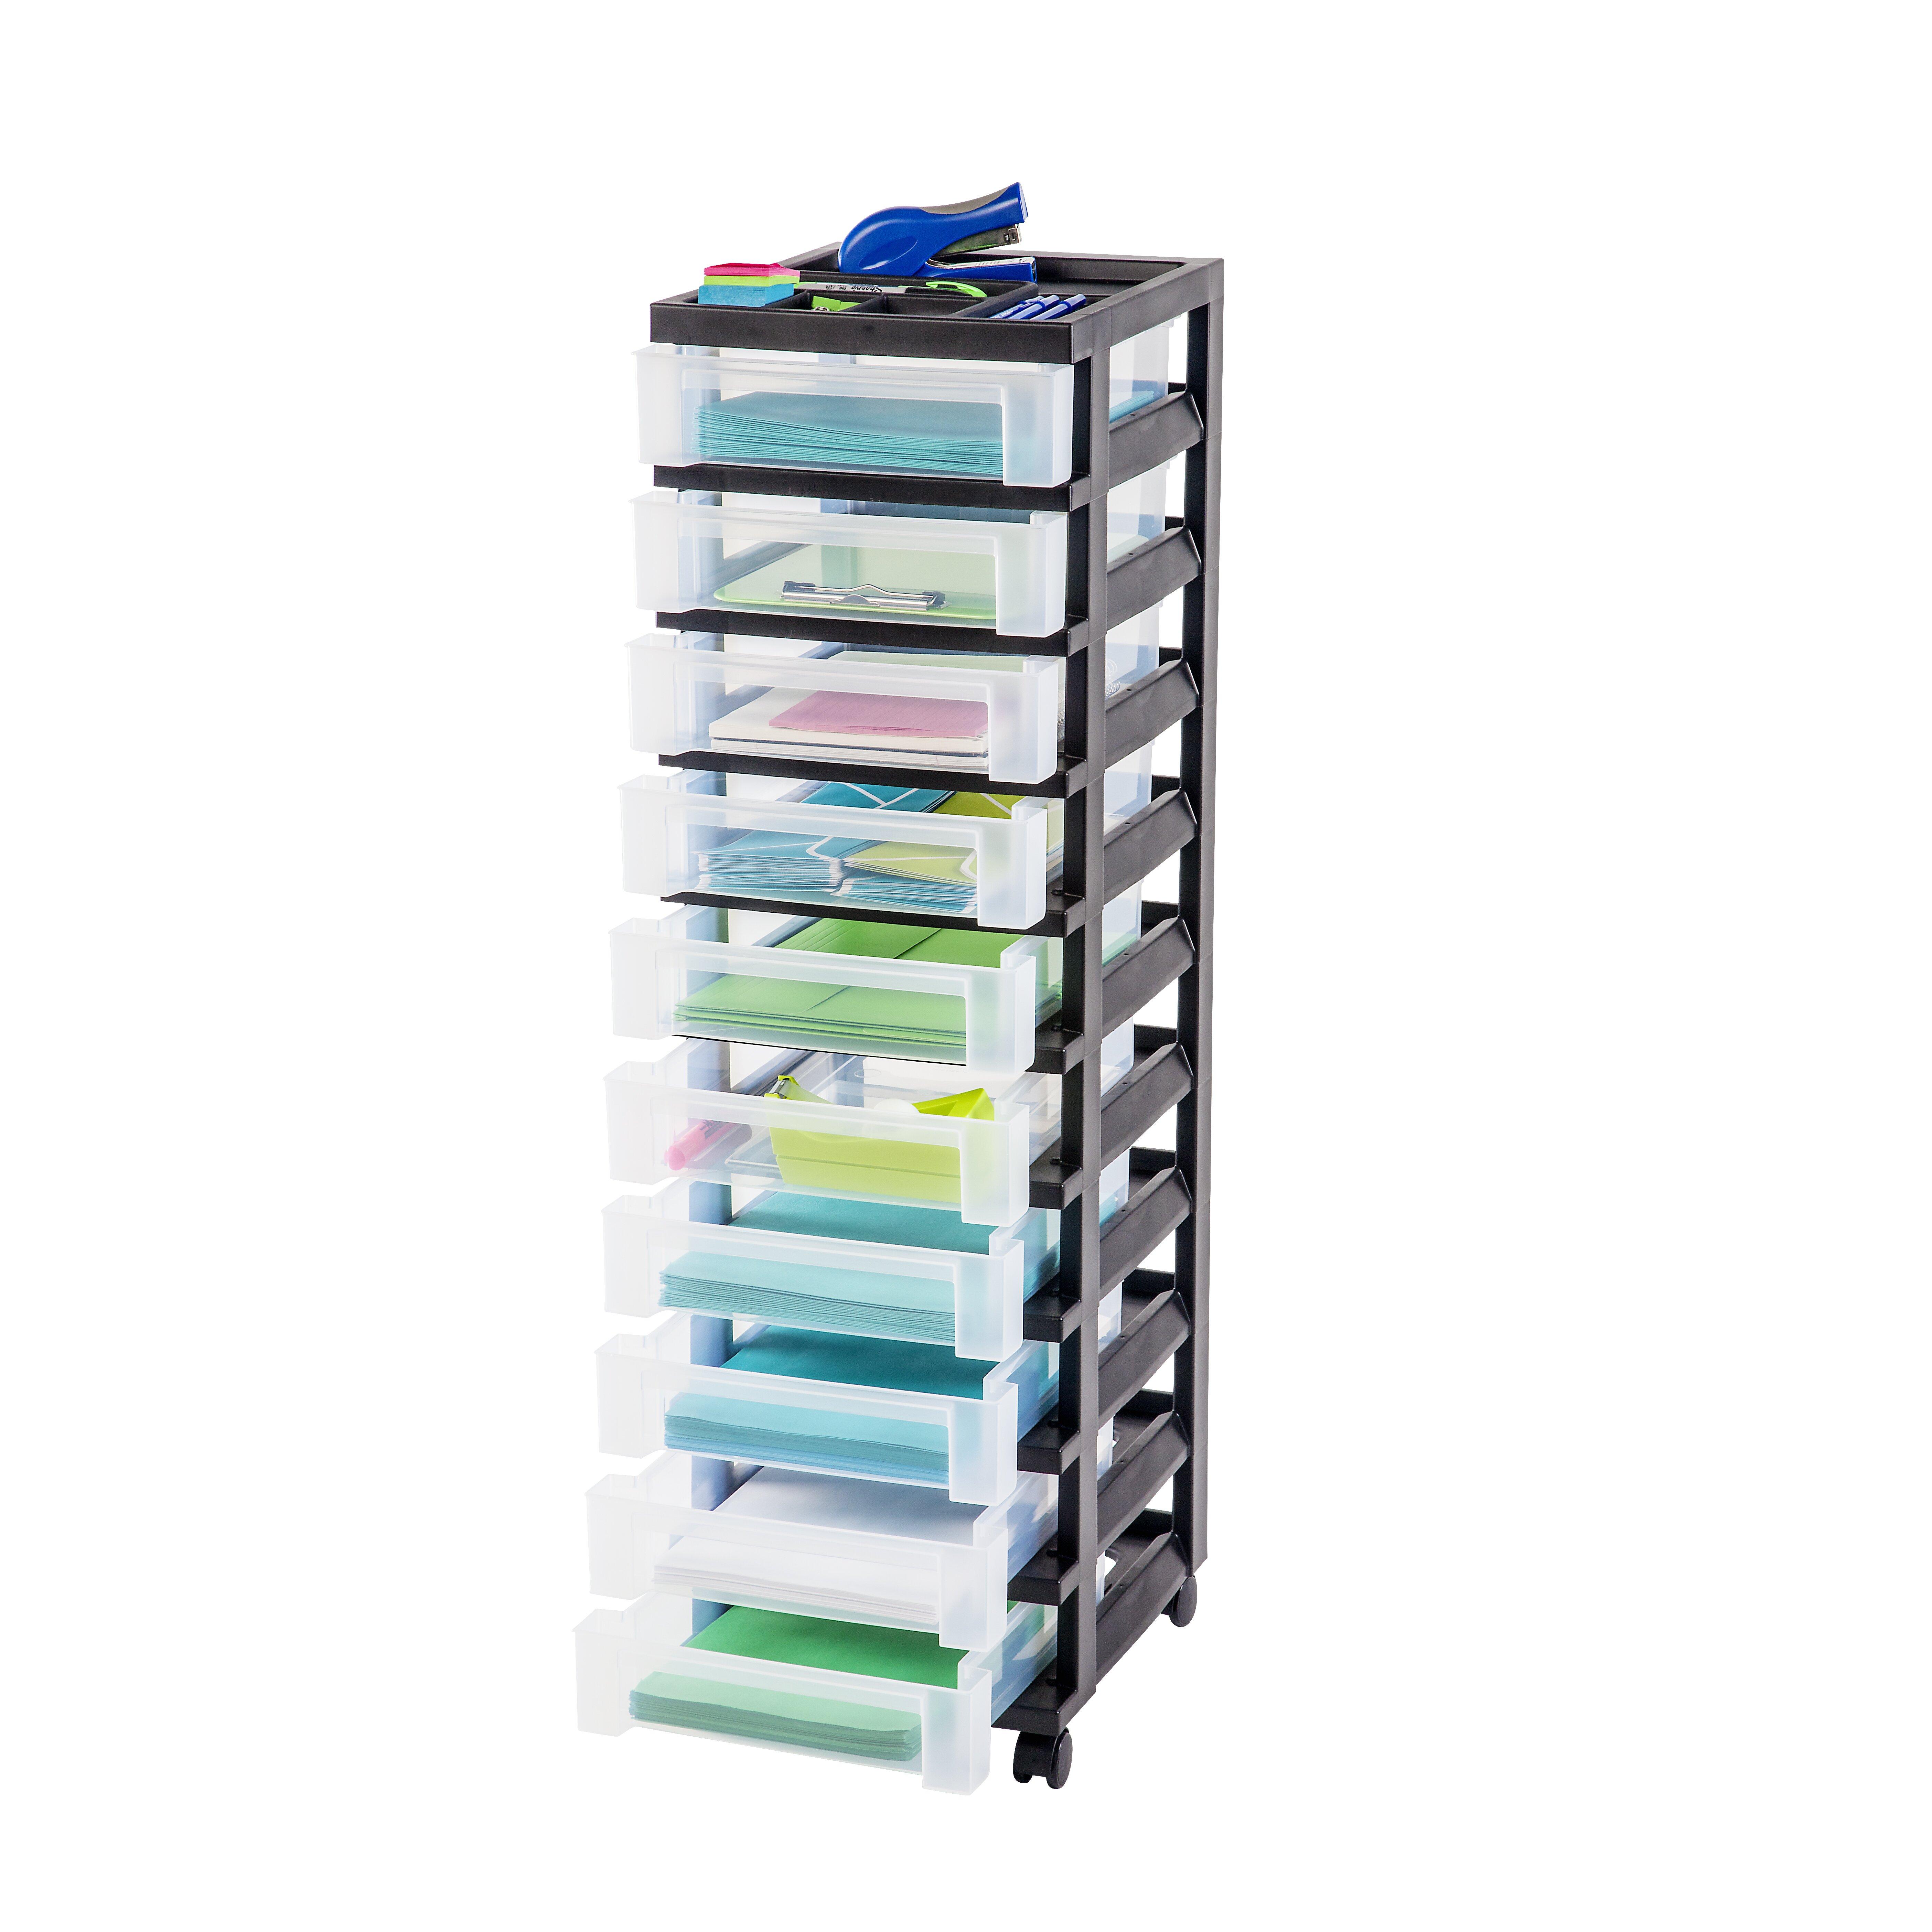 wayfair basics wayfair basics 10 drawer storage chest reviews. Black Bedroom Furniture Sets. Home Design Ideas